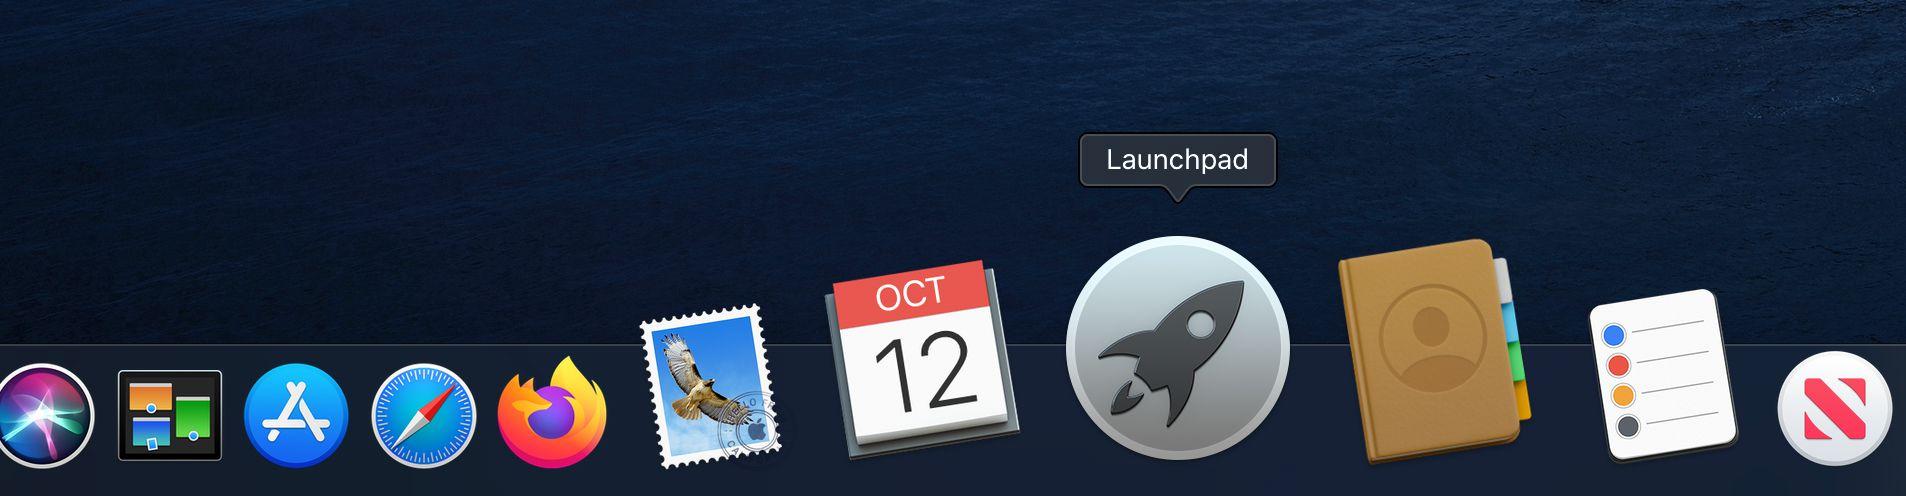 Launchpad icon on Macbook dock